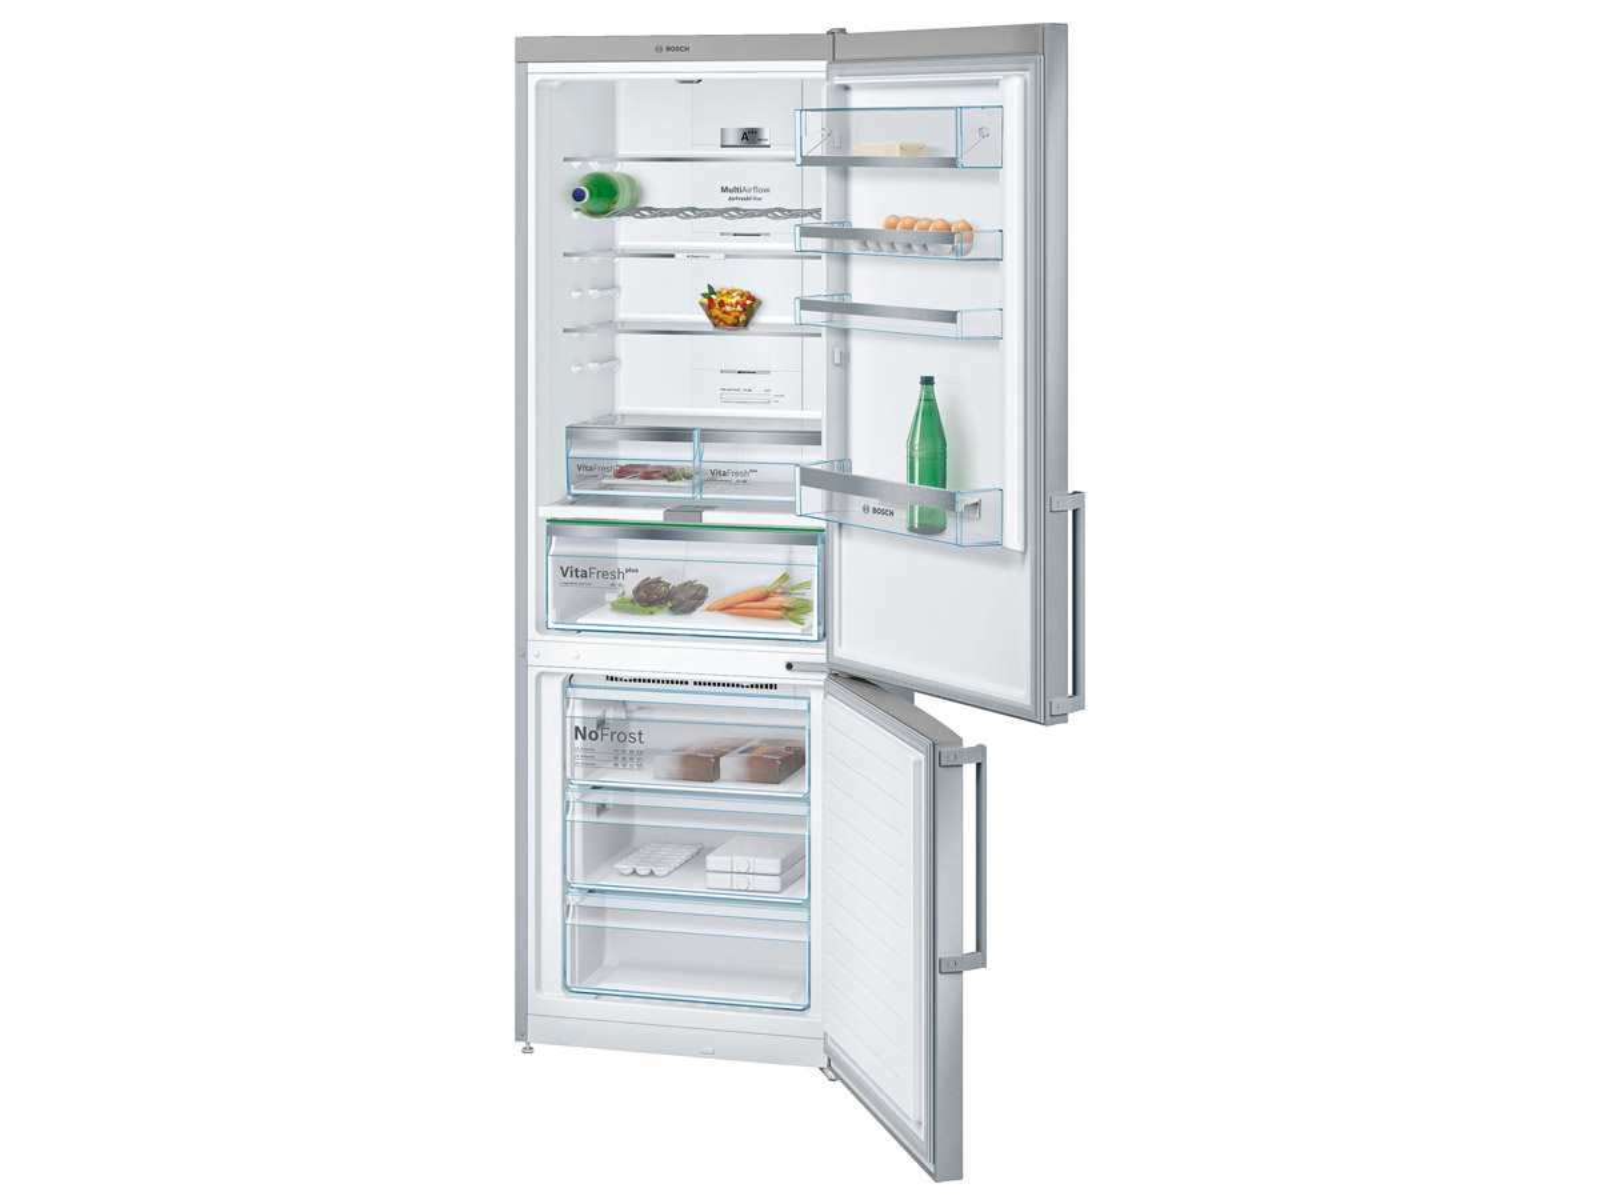 Bosch Kühlschrank Macht Geräusche : Neuer bosch kühlschrank laute geräusche: bosch kgn49ai40 kühl